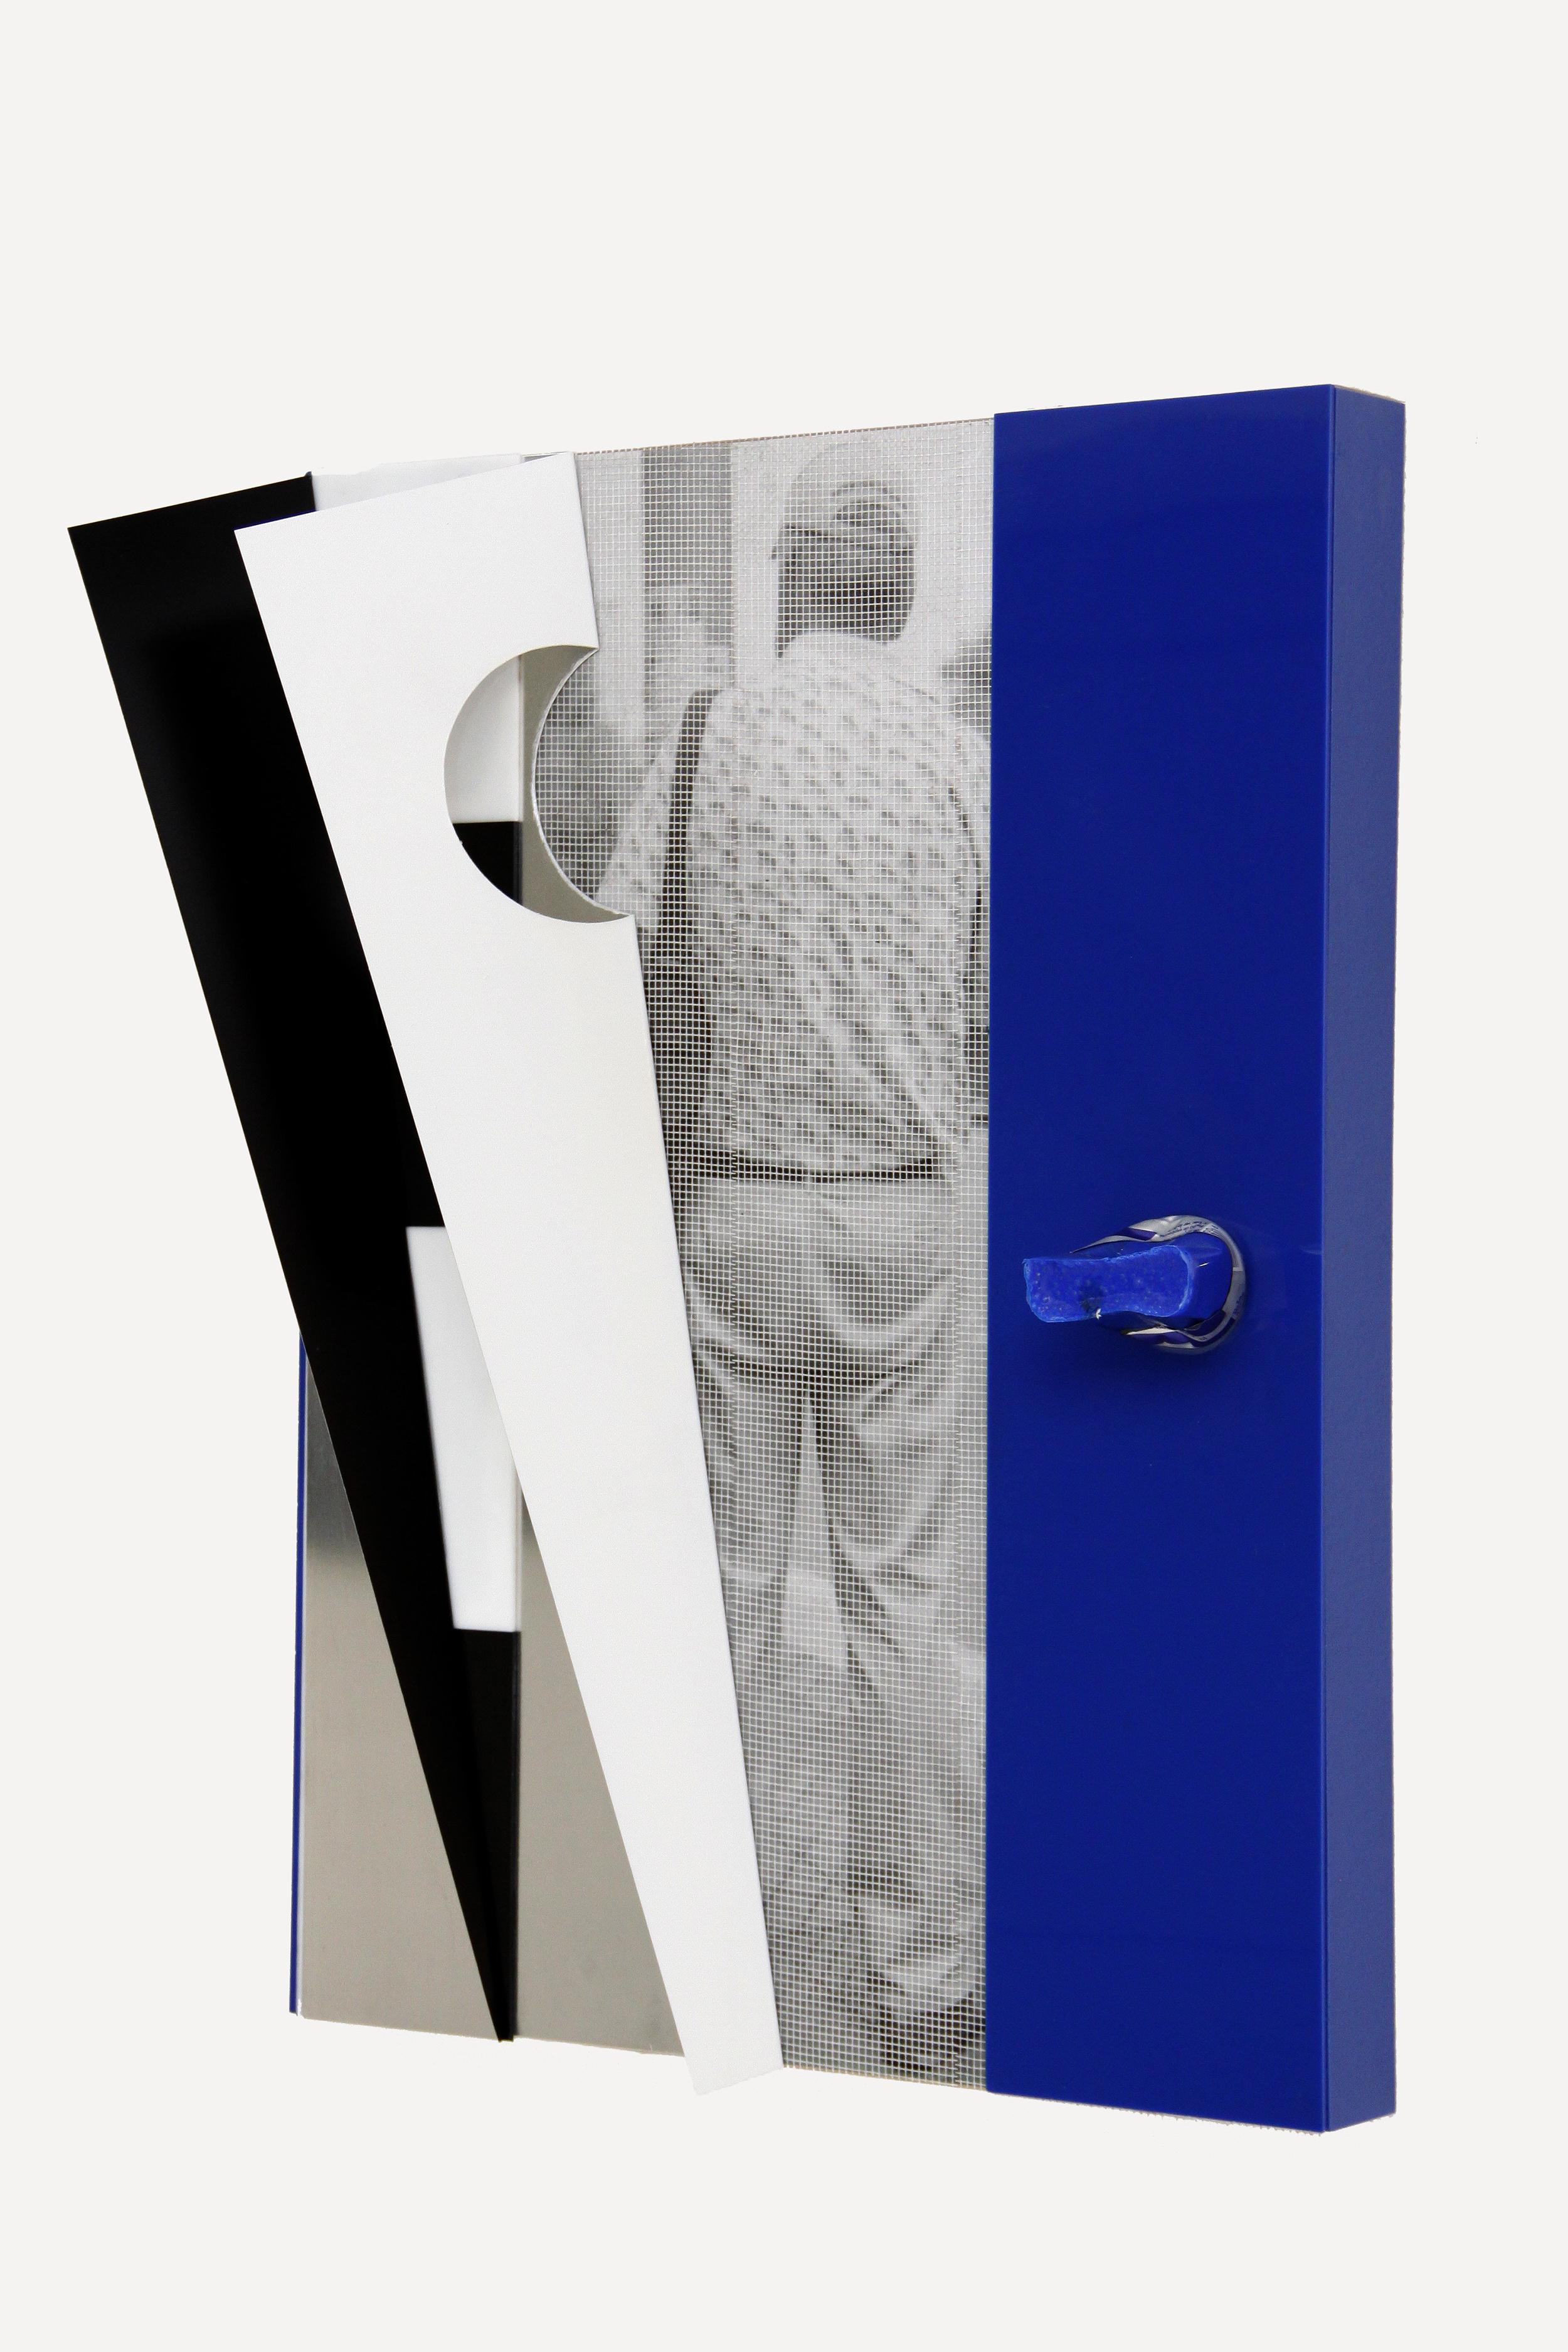 Pablo Jansana, Untitled #1, 2014, Epson Ultrachrome Pro 4880 Inkjet Print,  Lambda On MDF, Paper, Fiberglass, Plexiglass, Wood And Aluminum, 17 × 23 ×  6 In.